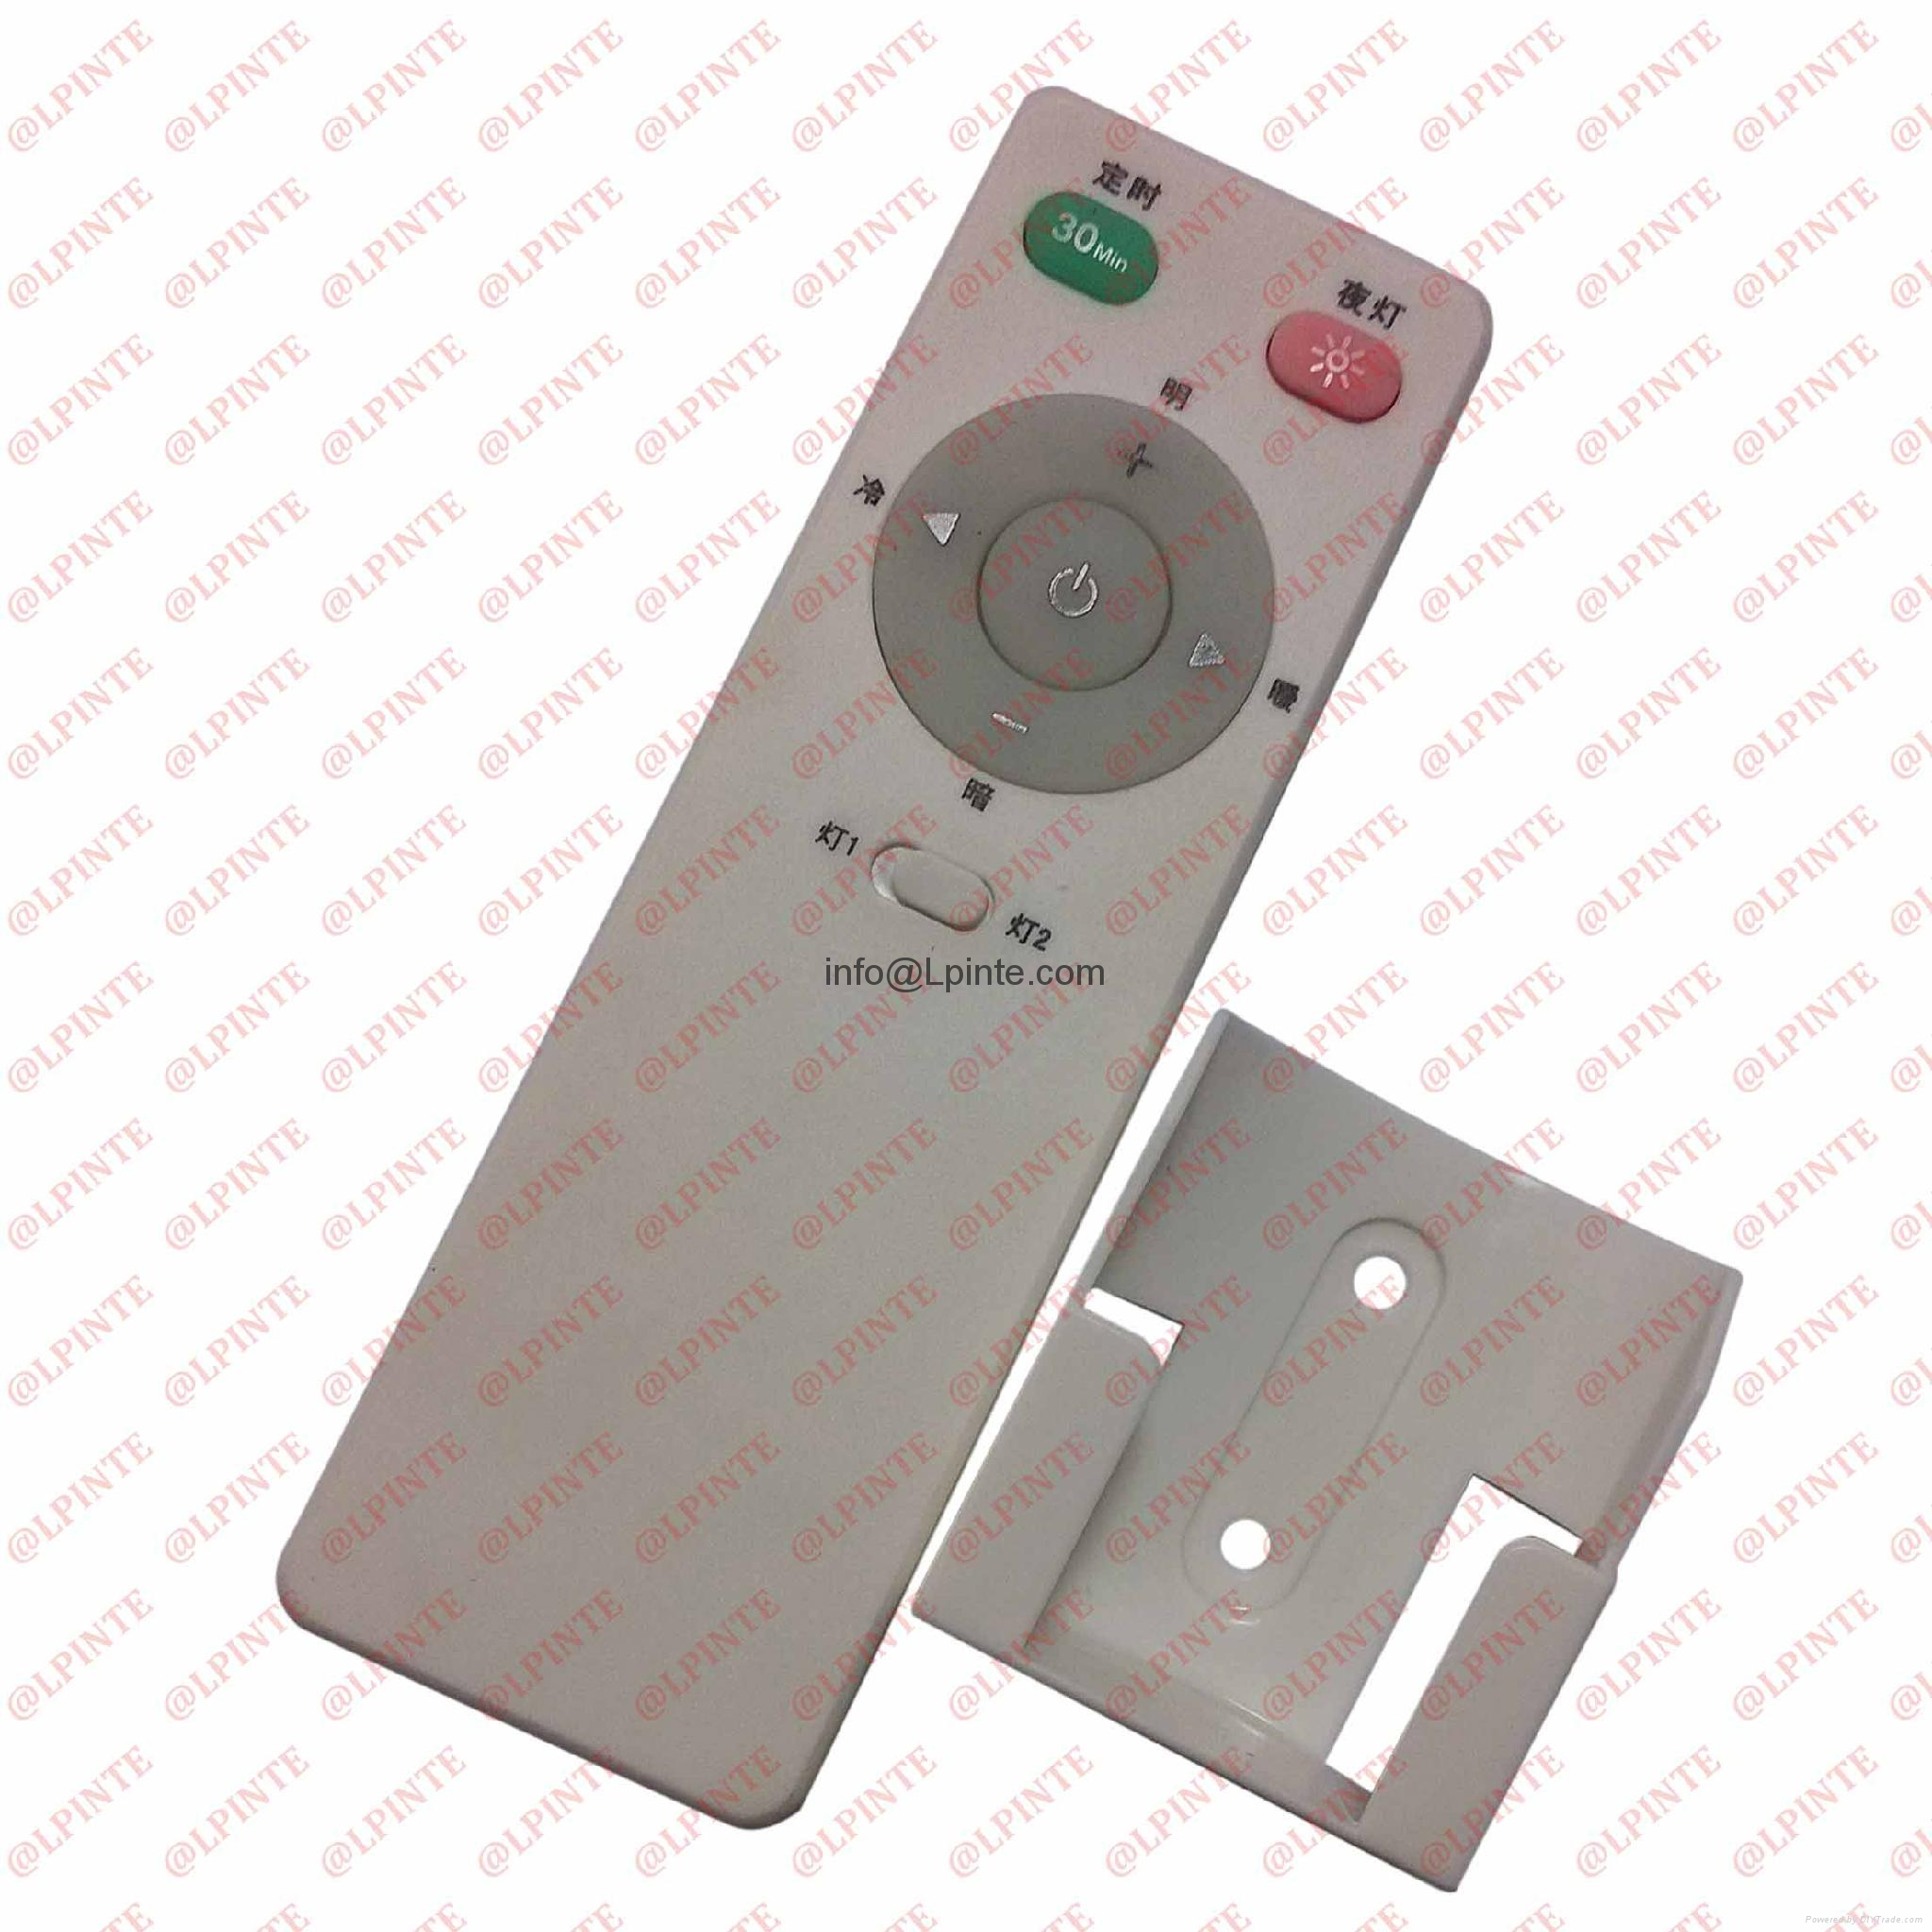 audio media tv remote control 7 keys rubber botton with holder LPI-R07B